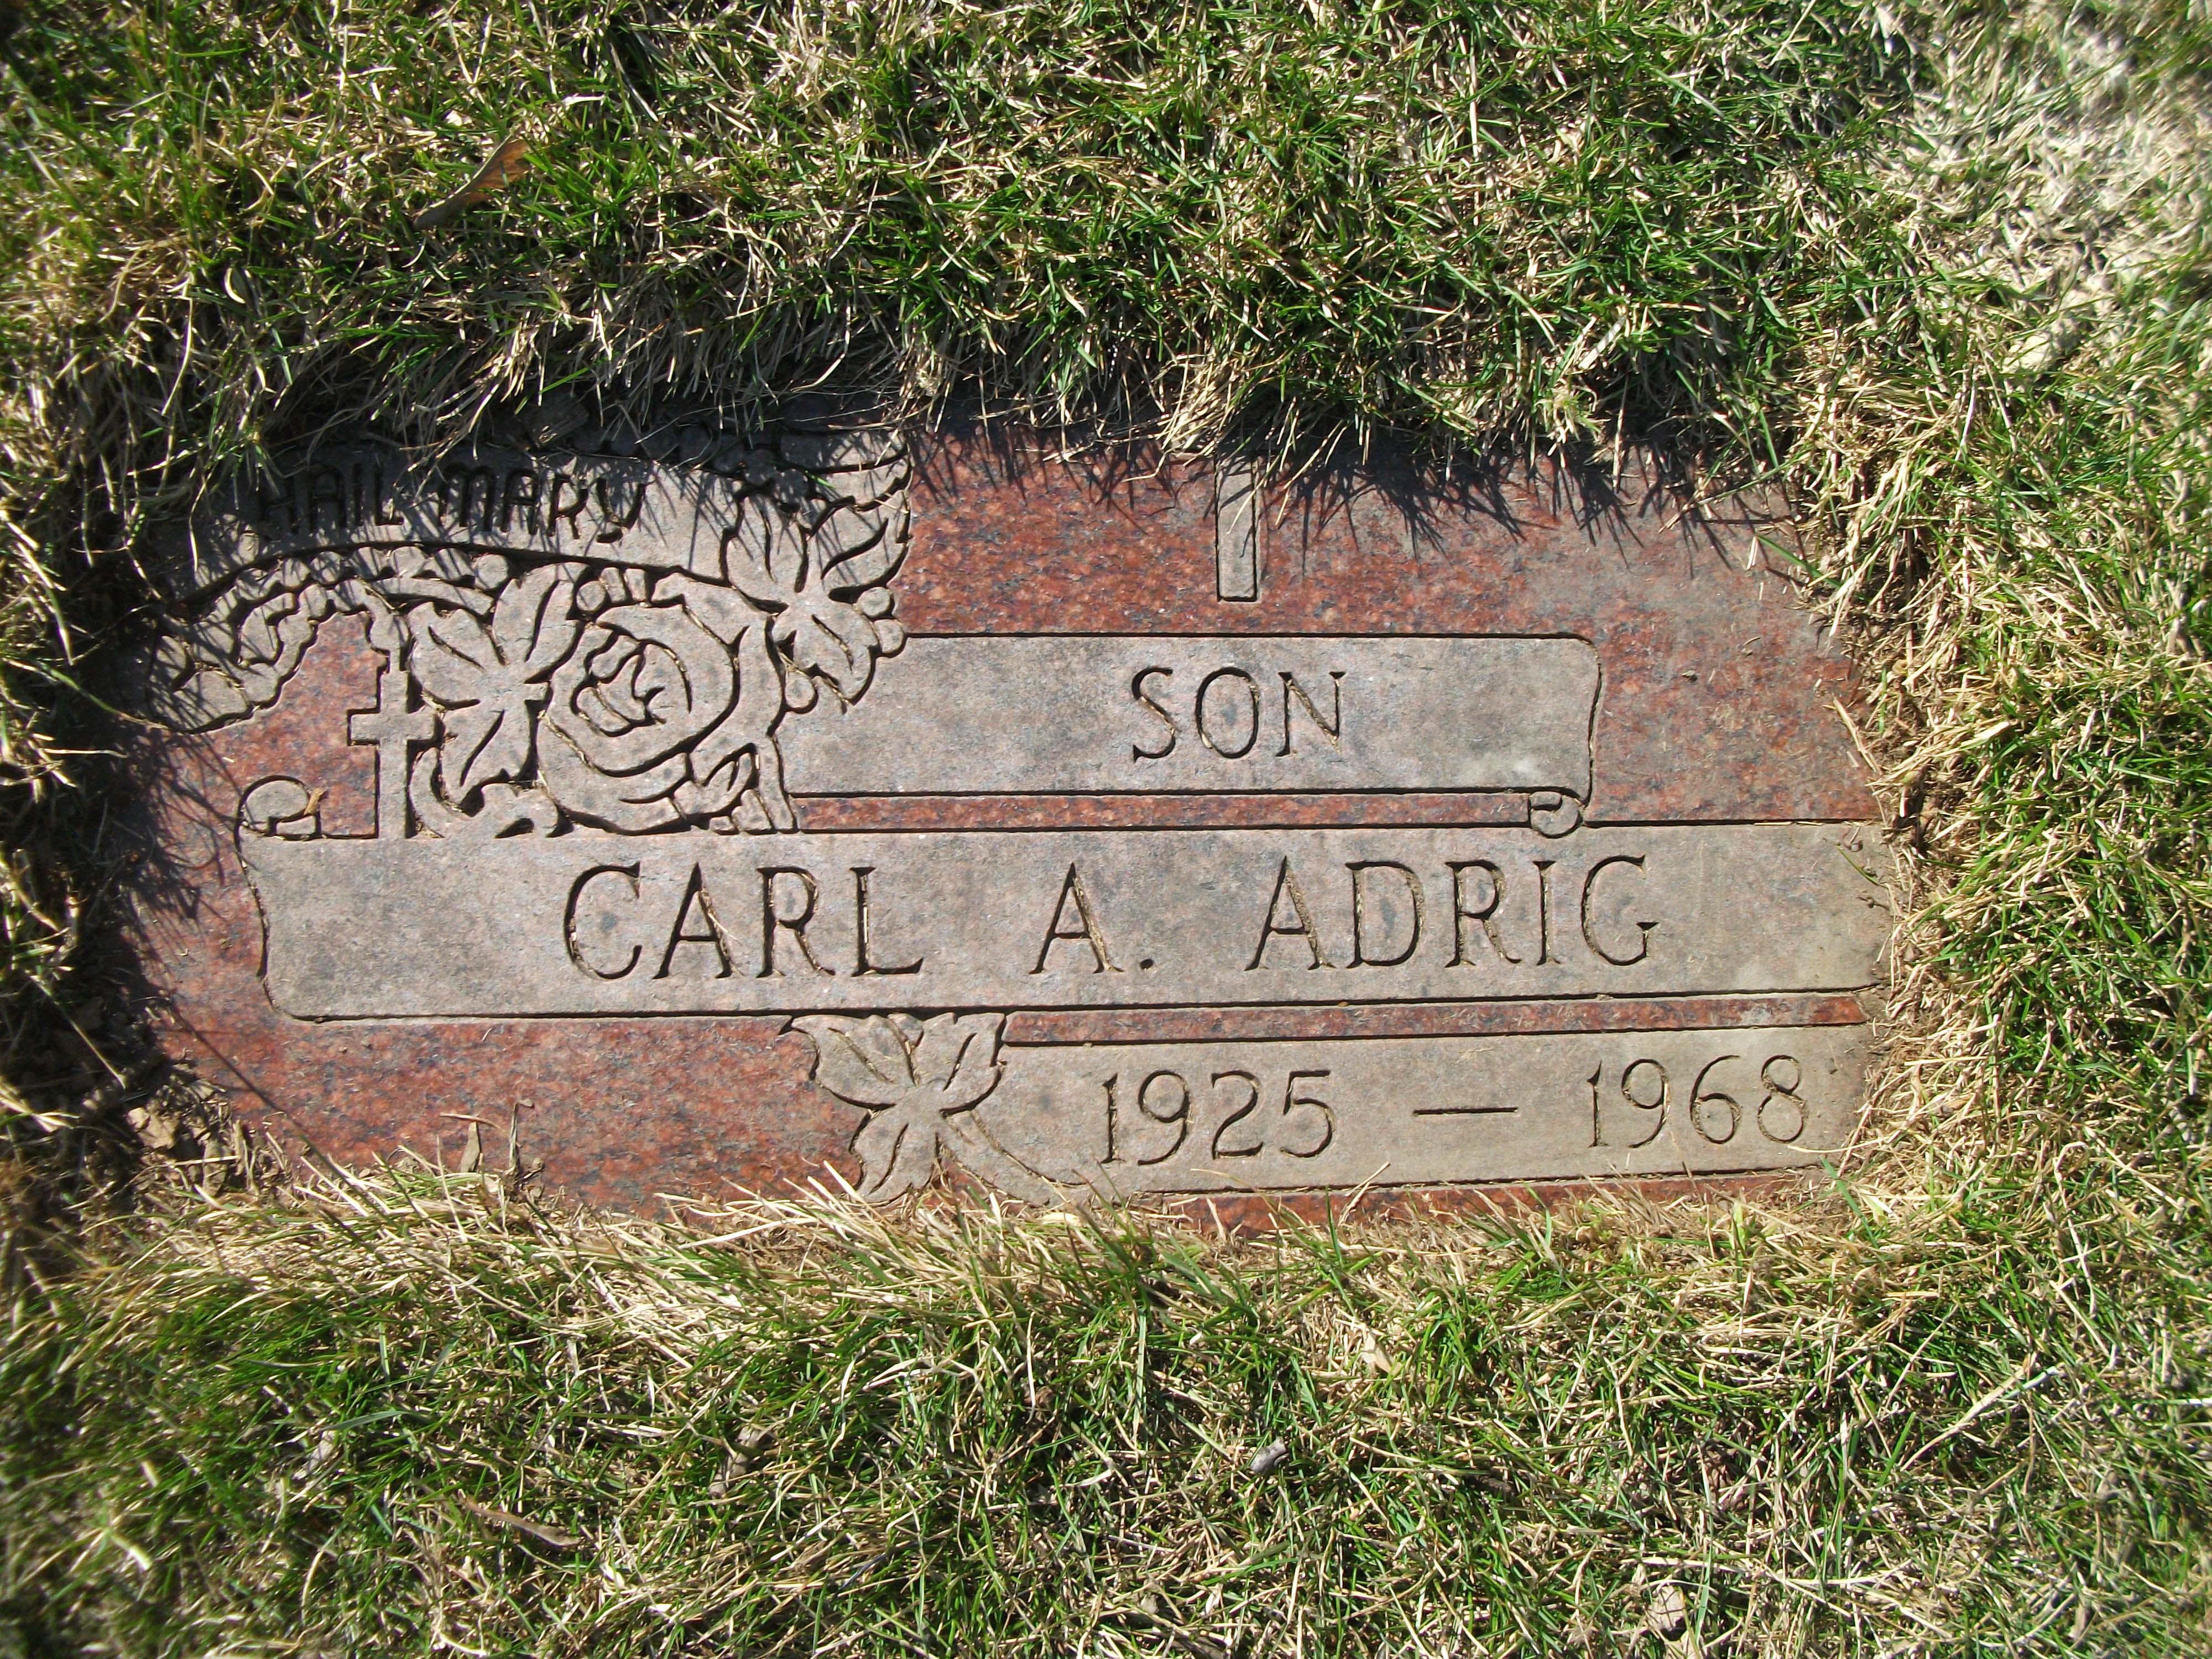 Carl Andrew Adrig